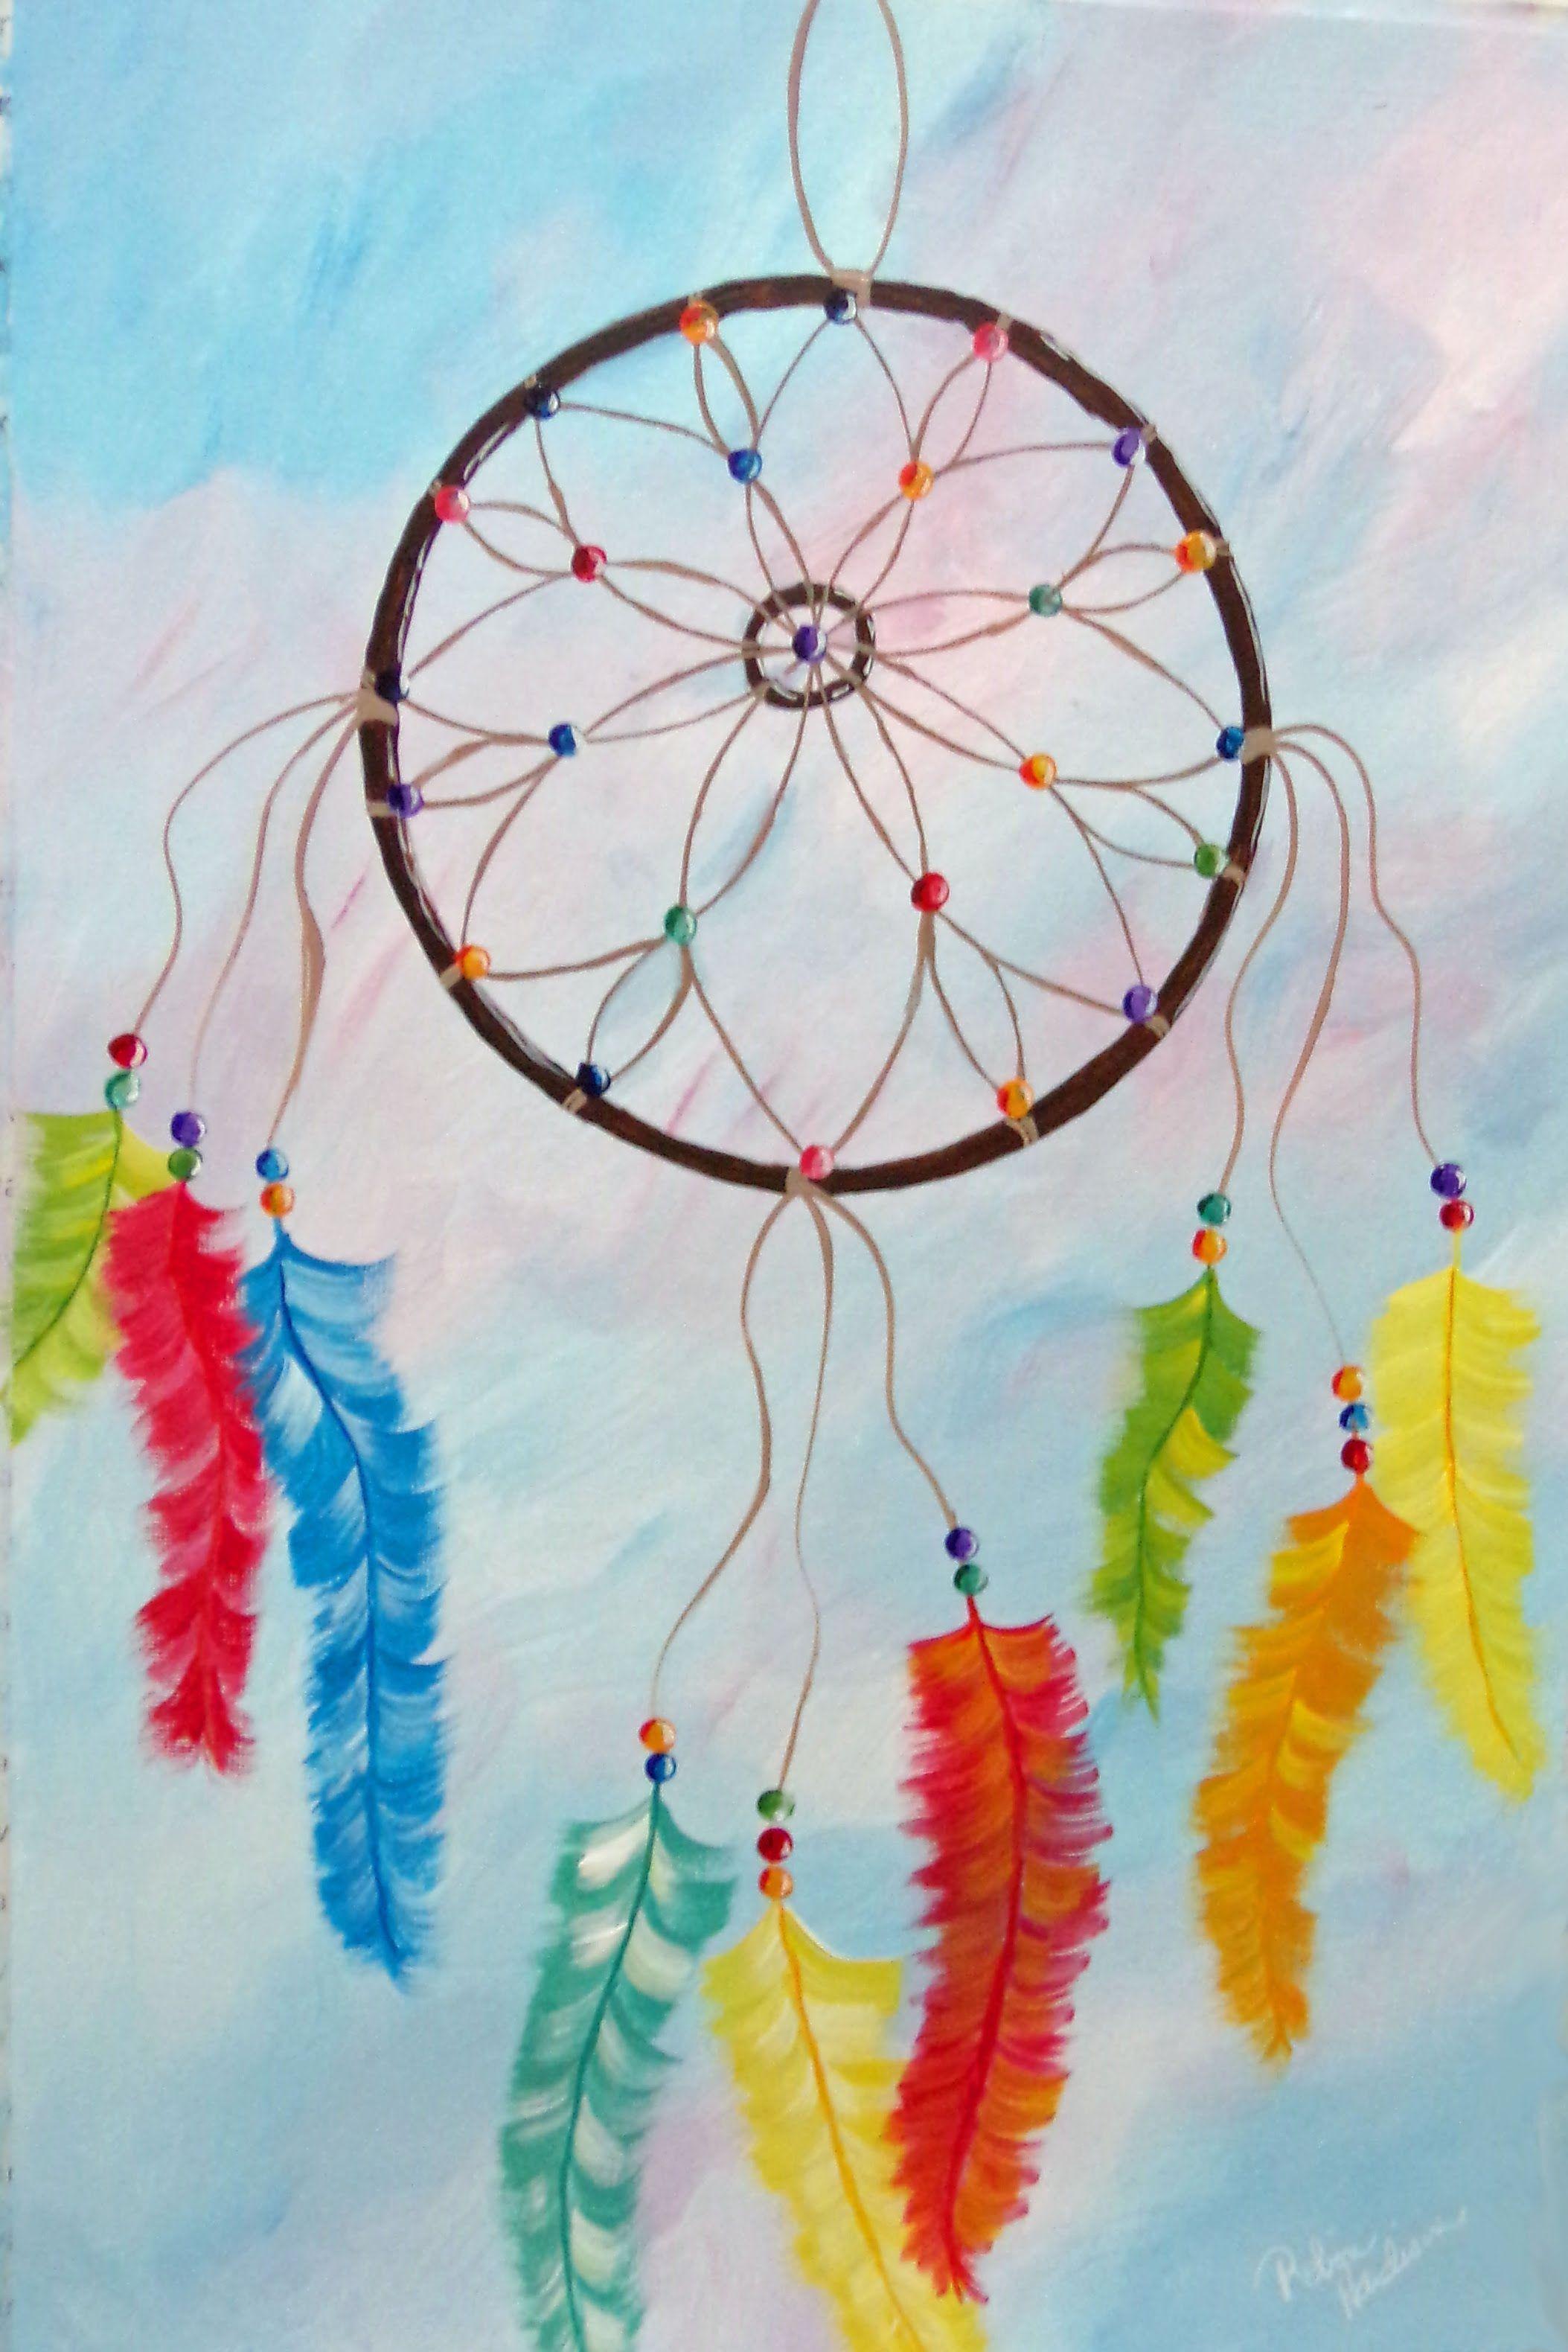 Dream Catcher Acrylic Painting : dream, catcher, acrylic, painting, Paint, Dream, Catcher, Length, Tutorial, Acrylic, Painting, Lesson, Painting,, Canvas, Tutorials,